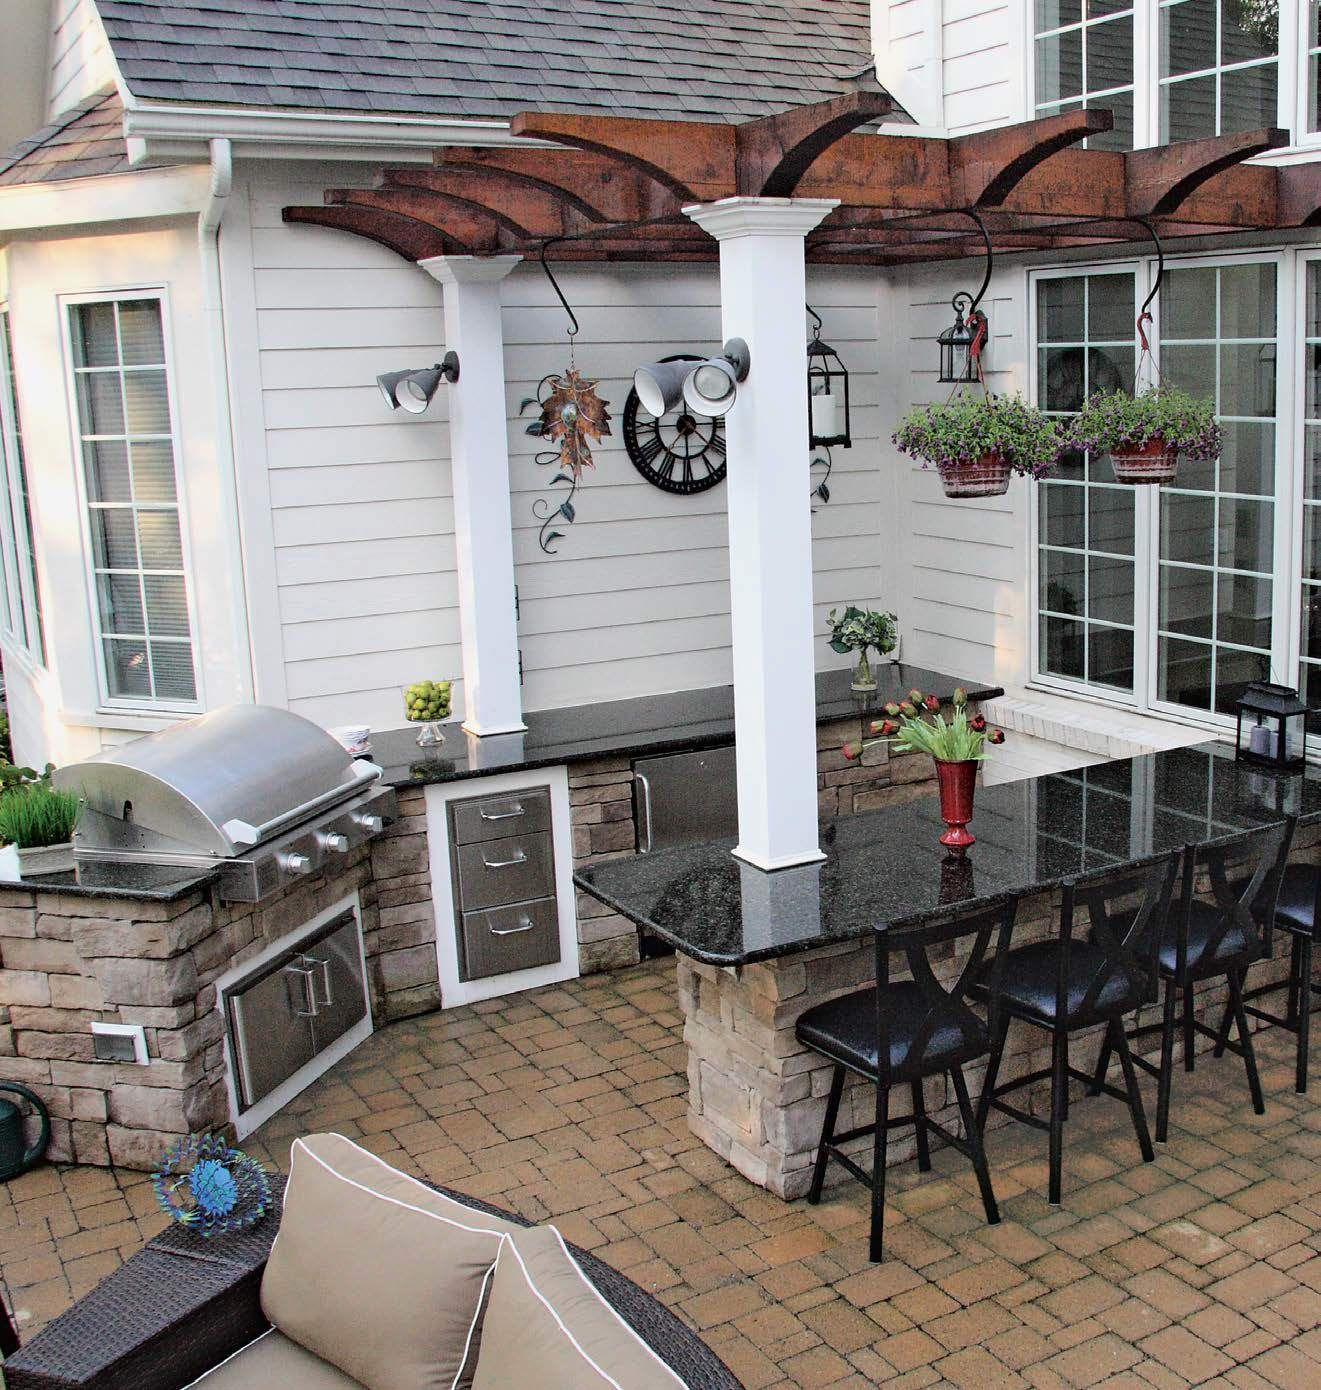 101 outdoor kitchen ideas and designs photos outdoor kitchen decor outdoor kitchen patio on outdoor kitchen plans layout id=62869